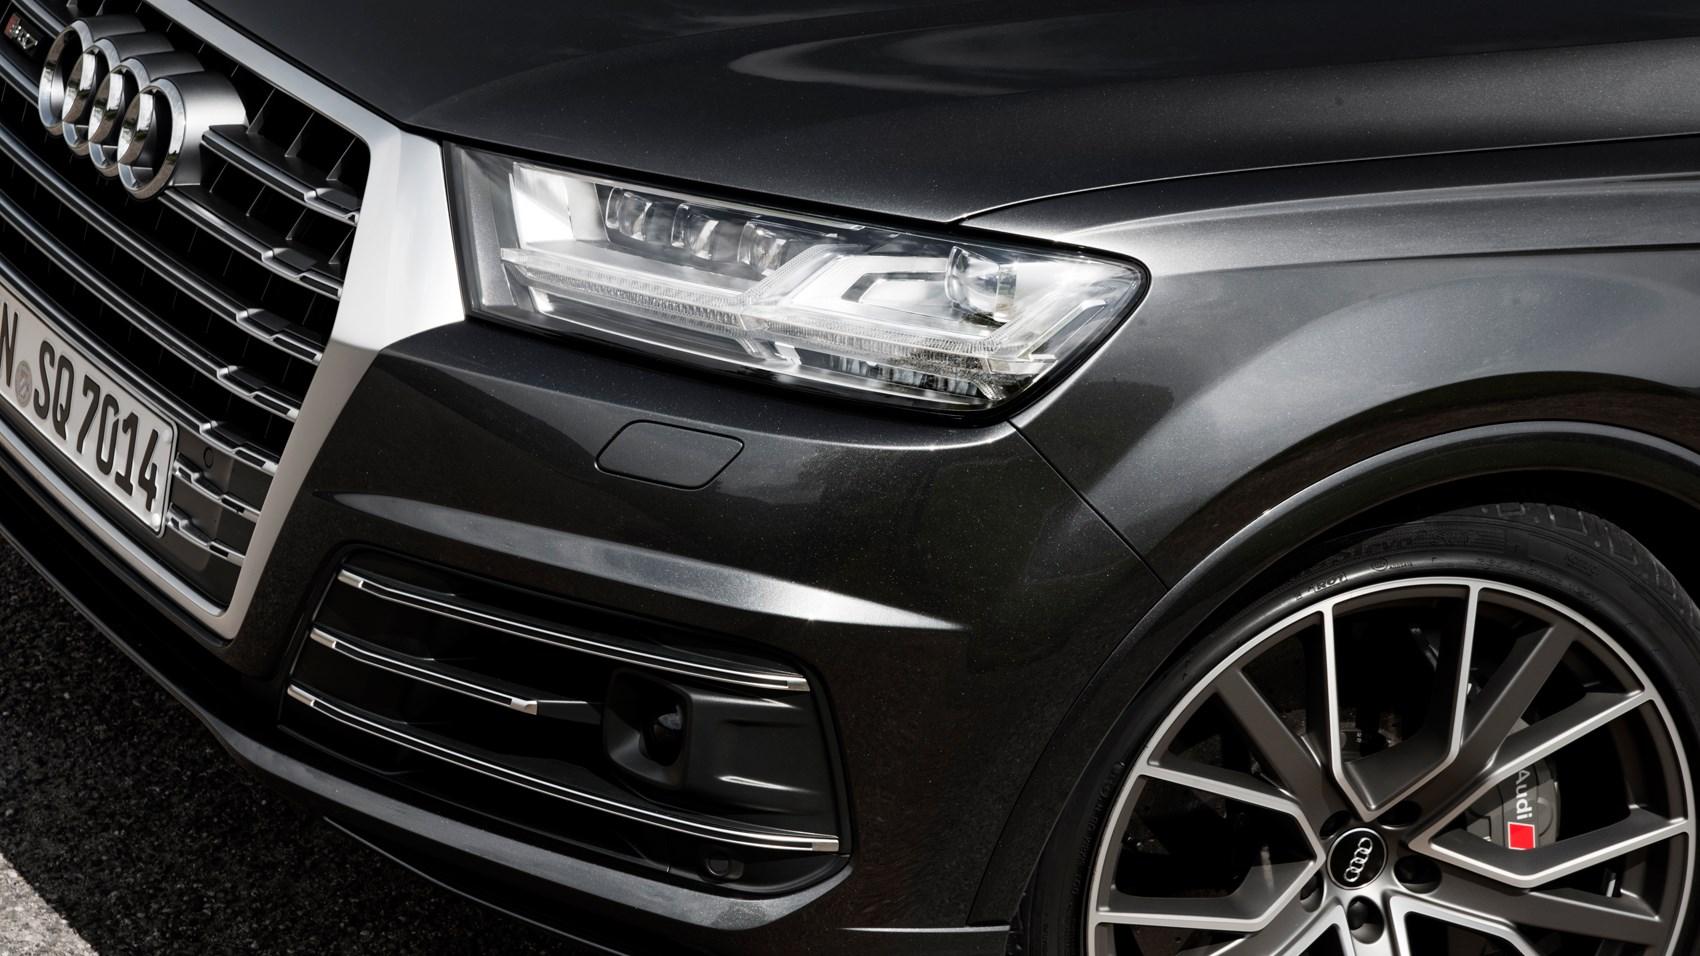 Audi audi sq7 tdi : Pin by John Wolters on Audi Q 7 | Pinterest